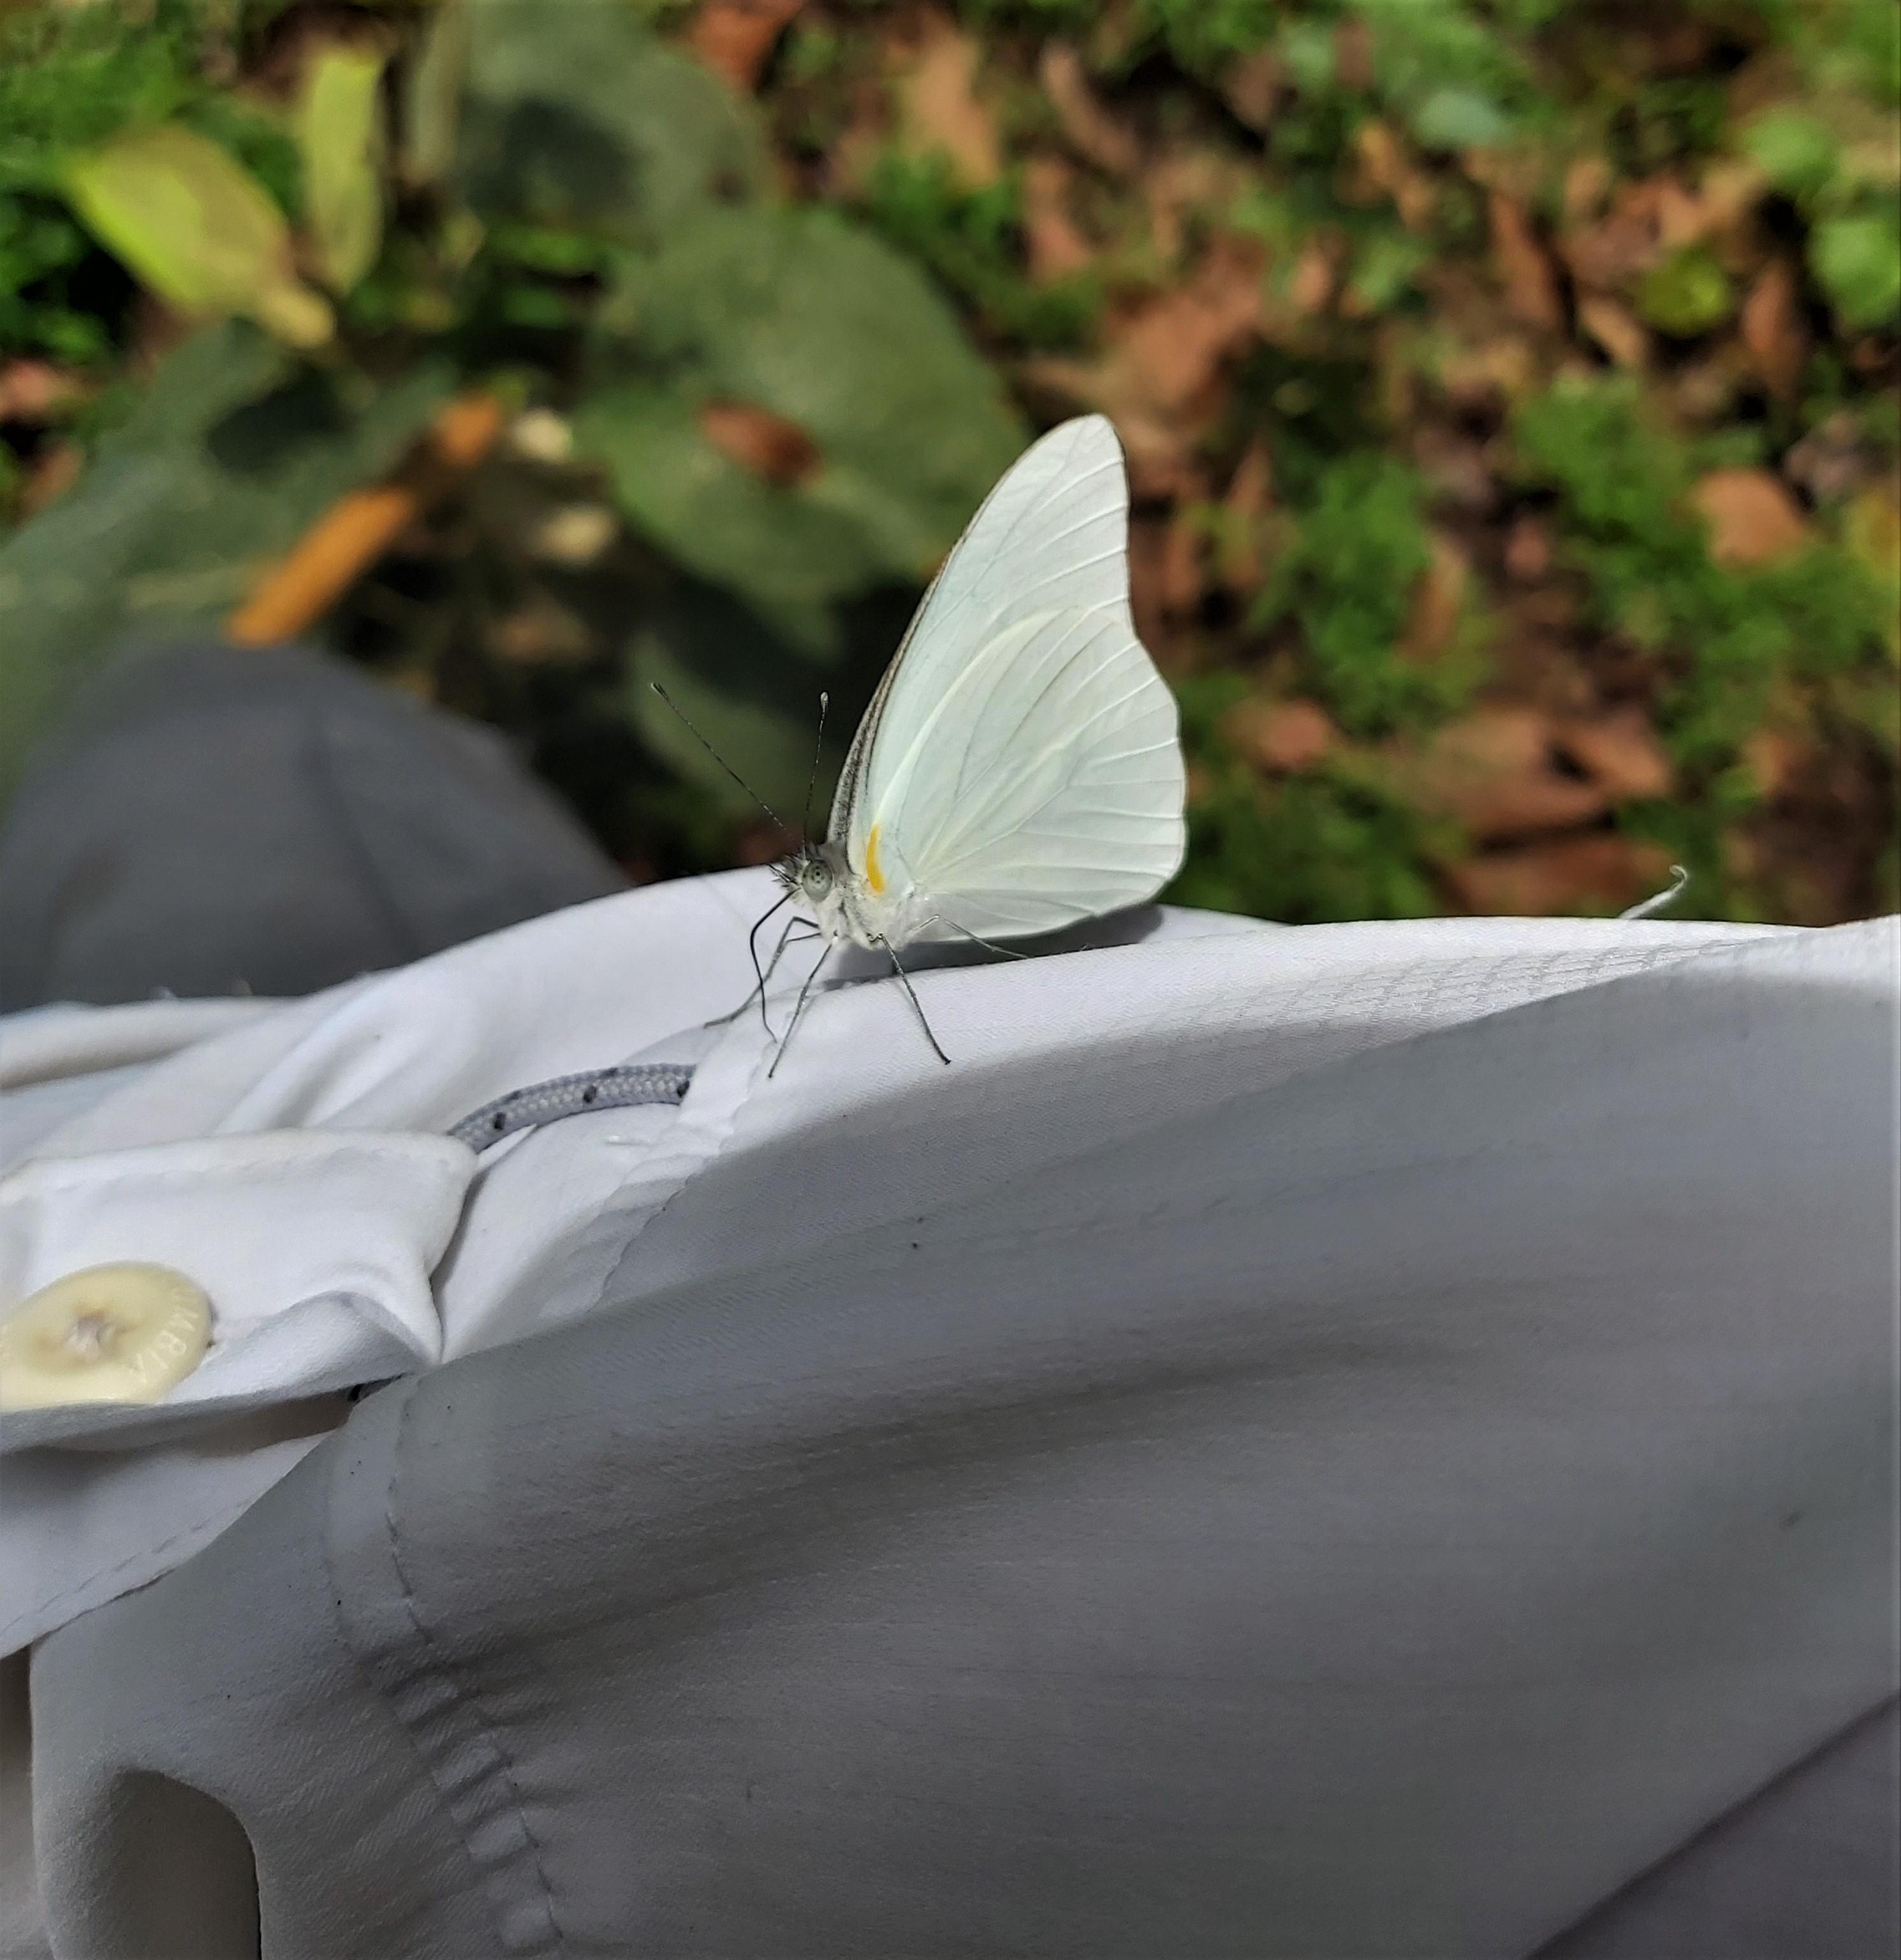 mariposa 2 cerca